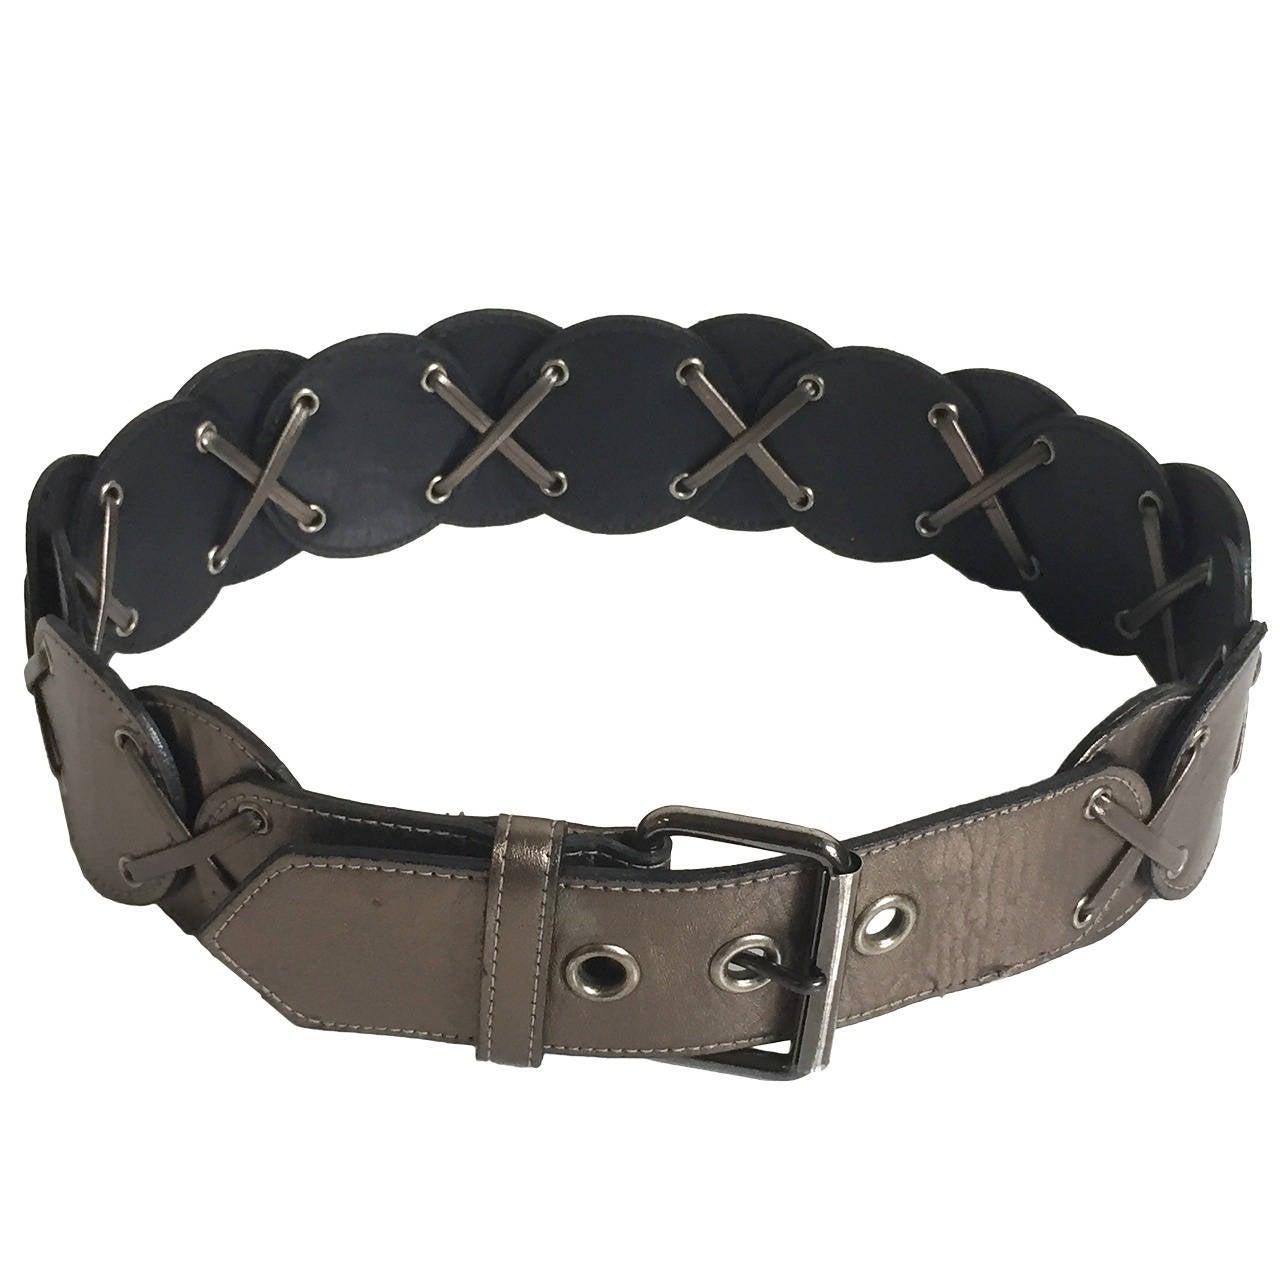 Yves Saint Laurent metallic leather belt, 1980s